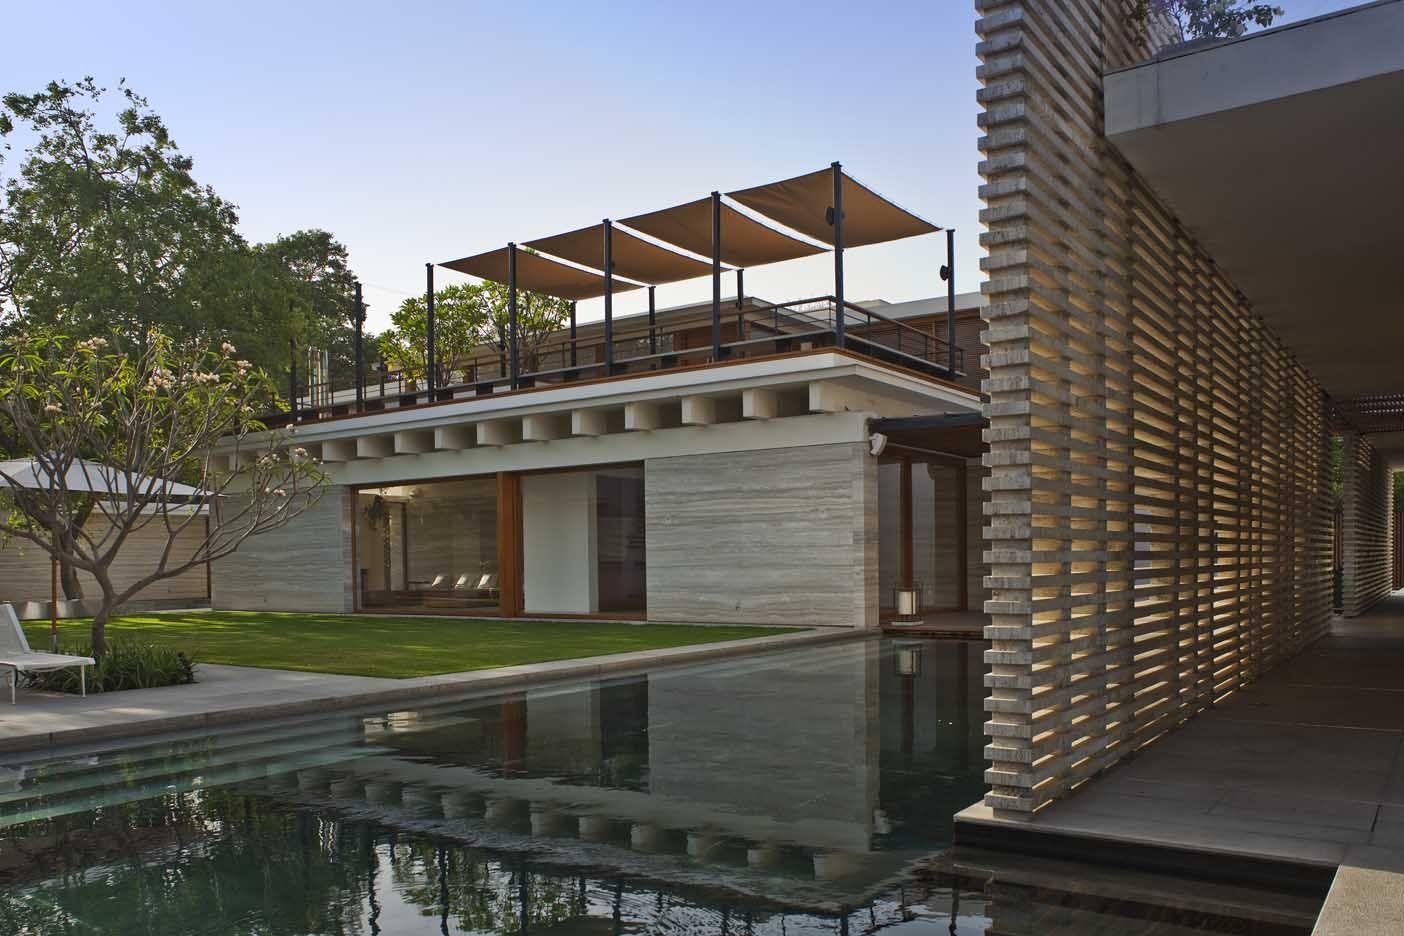 Amrita shergil marg house, by ernesto bedmar architects ...